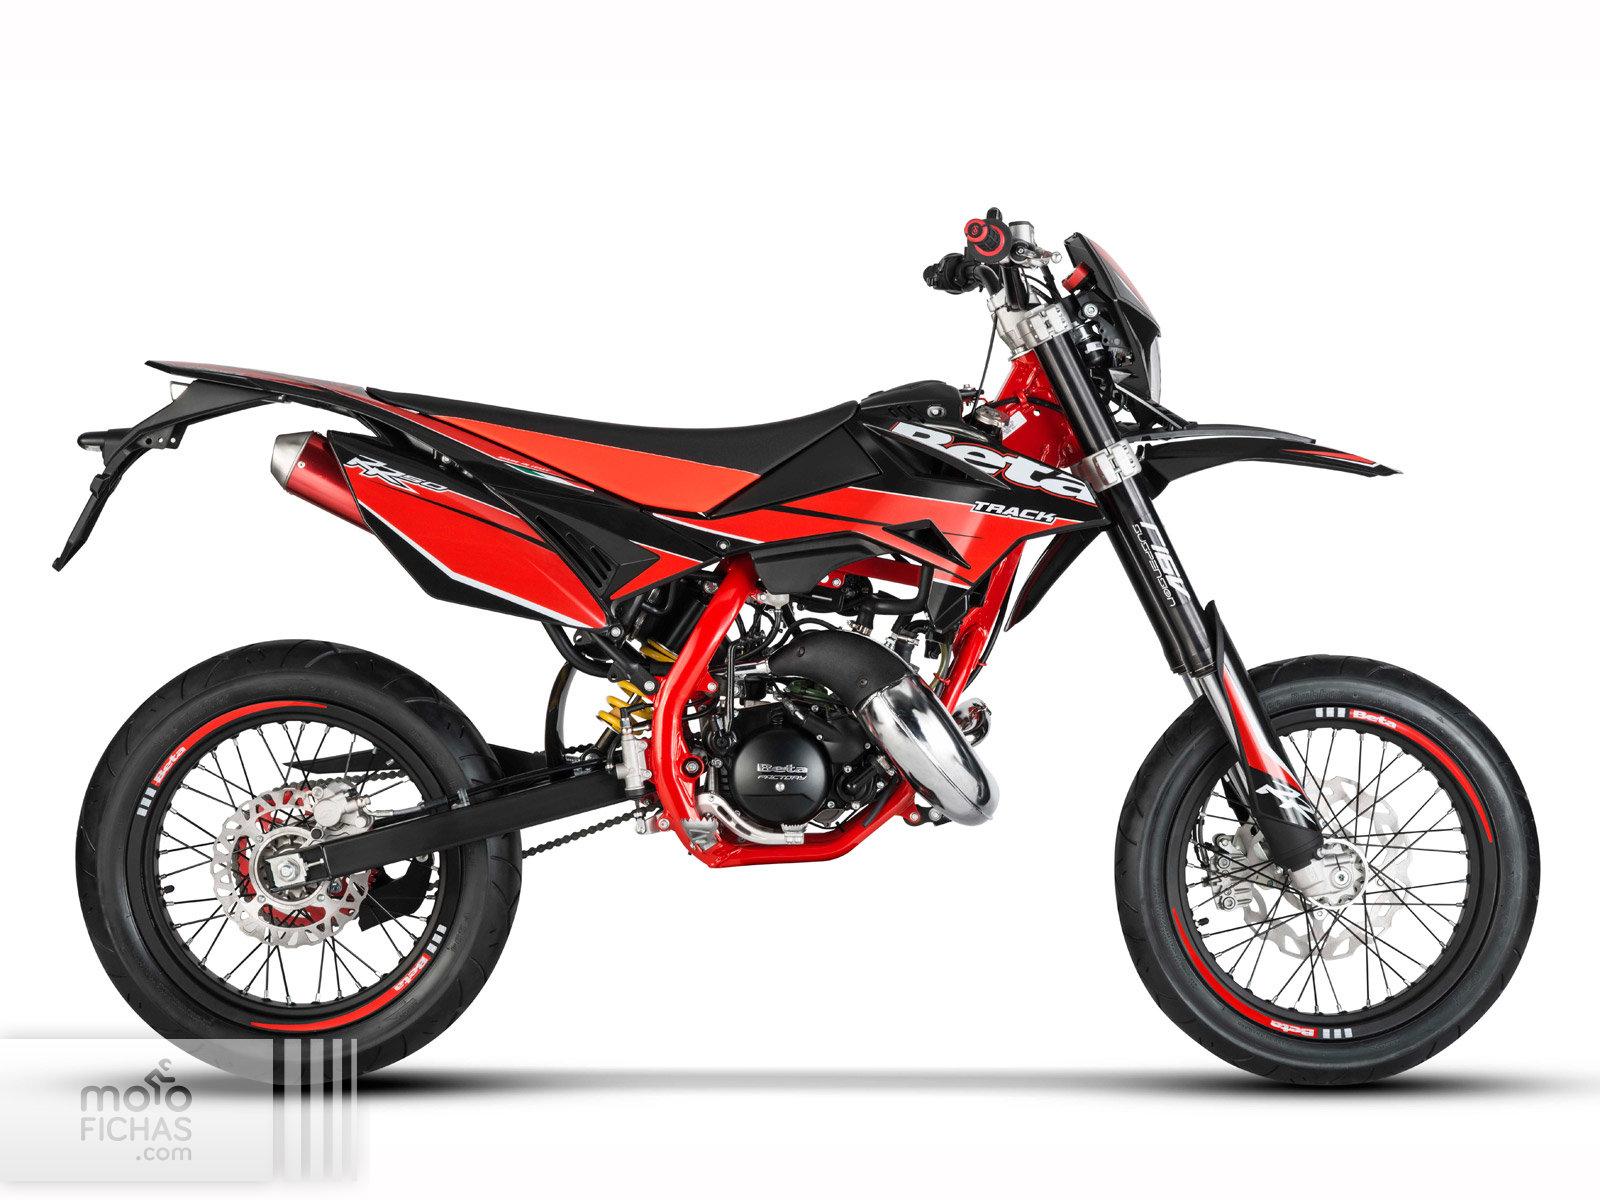 beta rr 50 motard sport track 2018 precio ficha opiniones. Black Bedroom Furniture Sets. Home Design Ideas